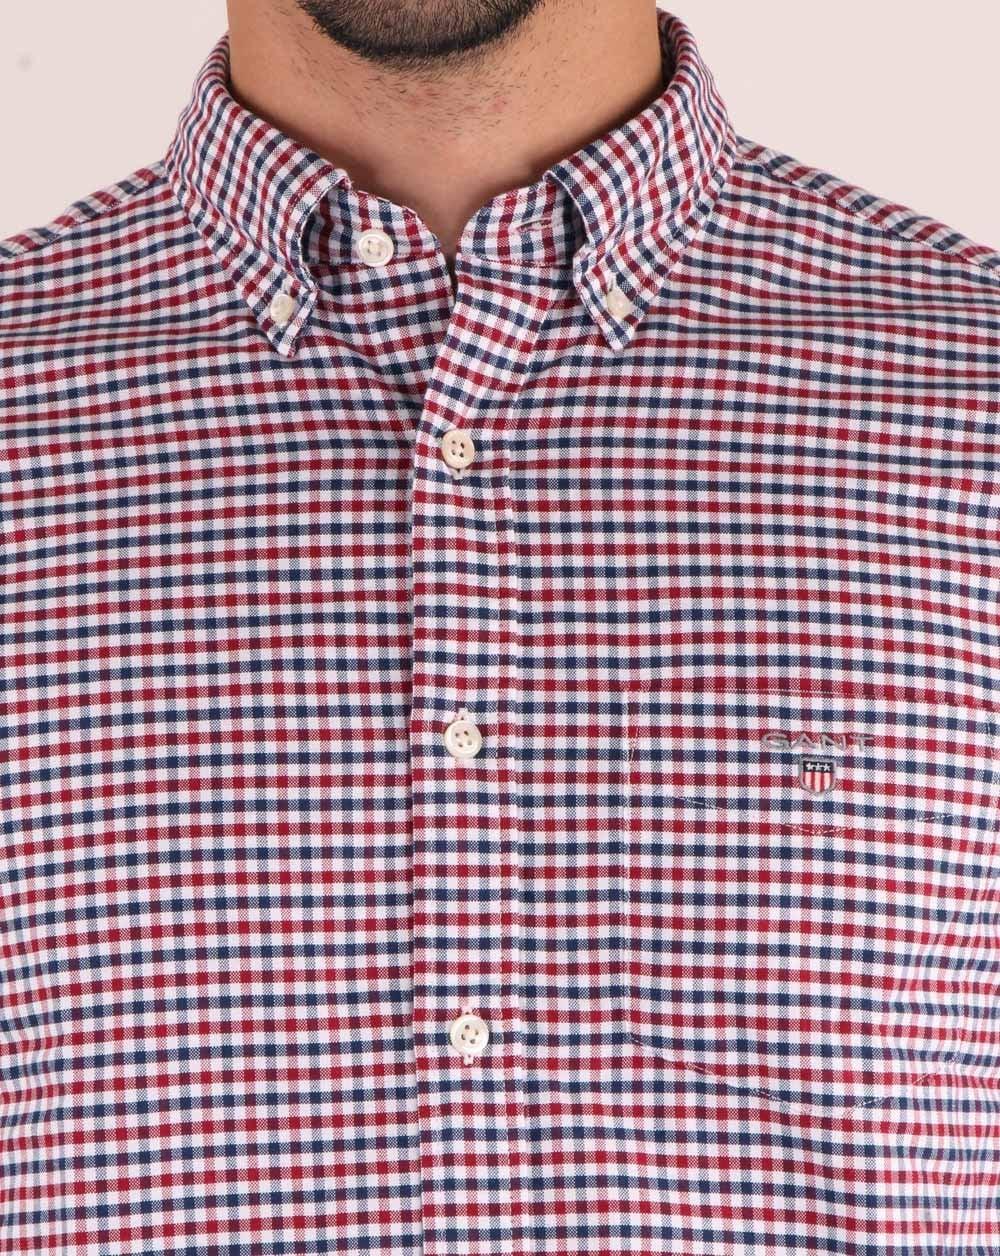 Gant Shirt Gant Men/'s The Oxford 3-Color Gingham Check Shirt Mahogny Red